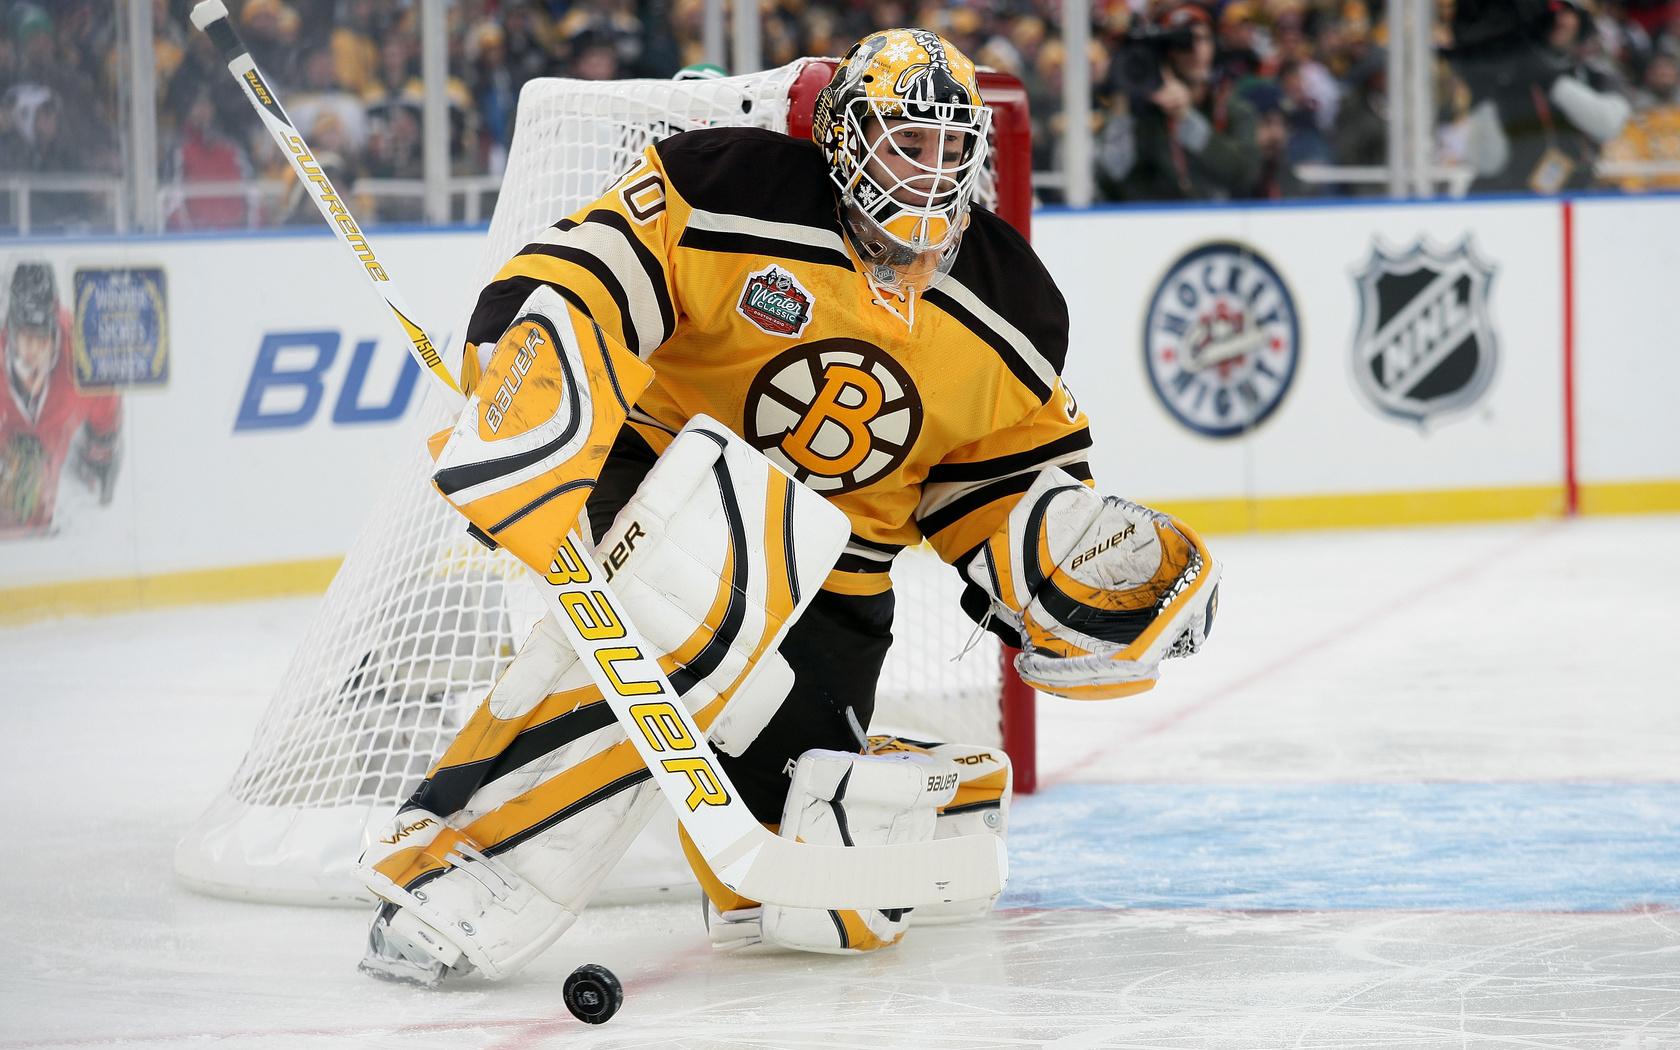 Спорт хоккей голкипер boston bruins обои